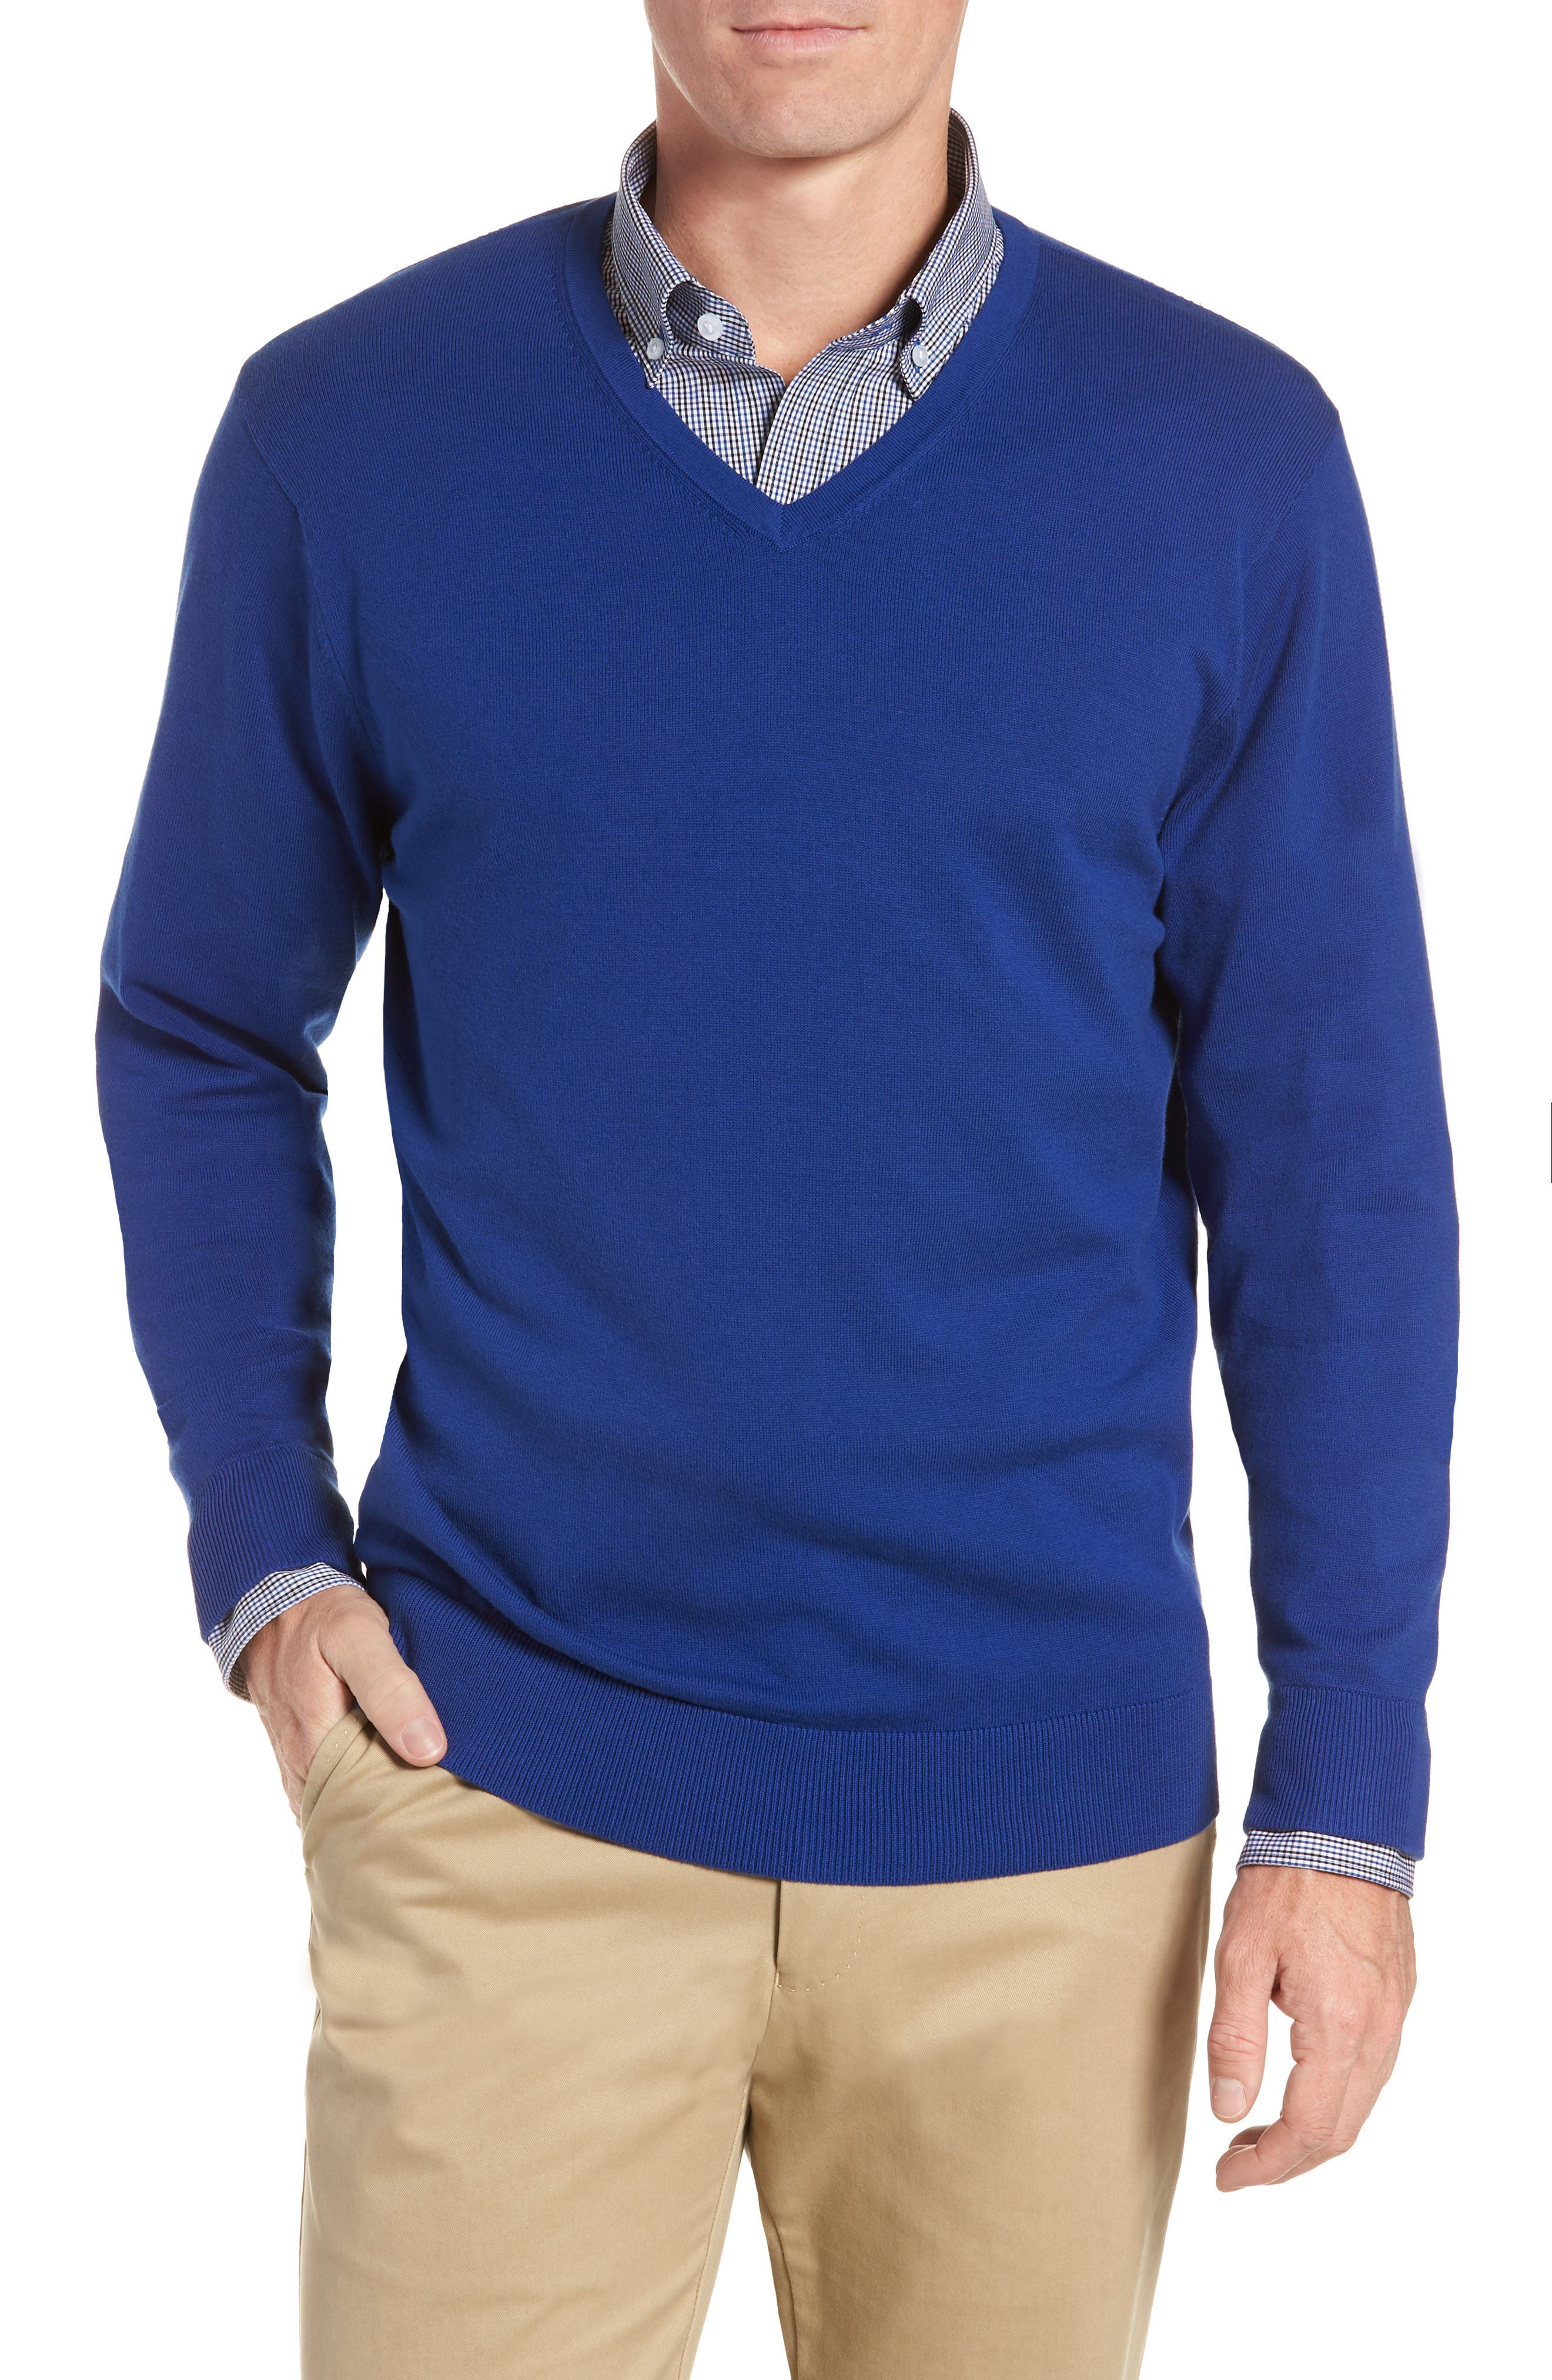 Cutter & Buck Lakemont V-Neck Sweater, Blue